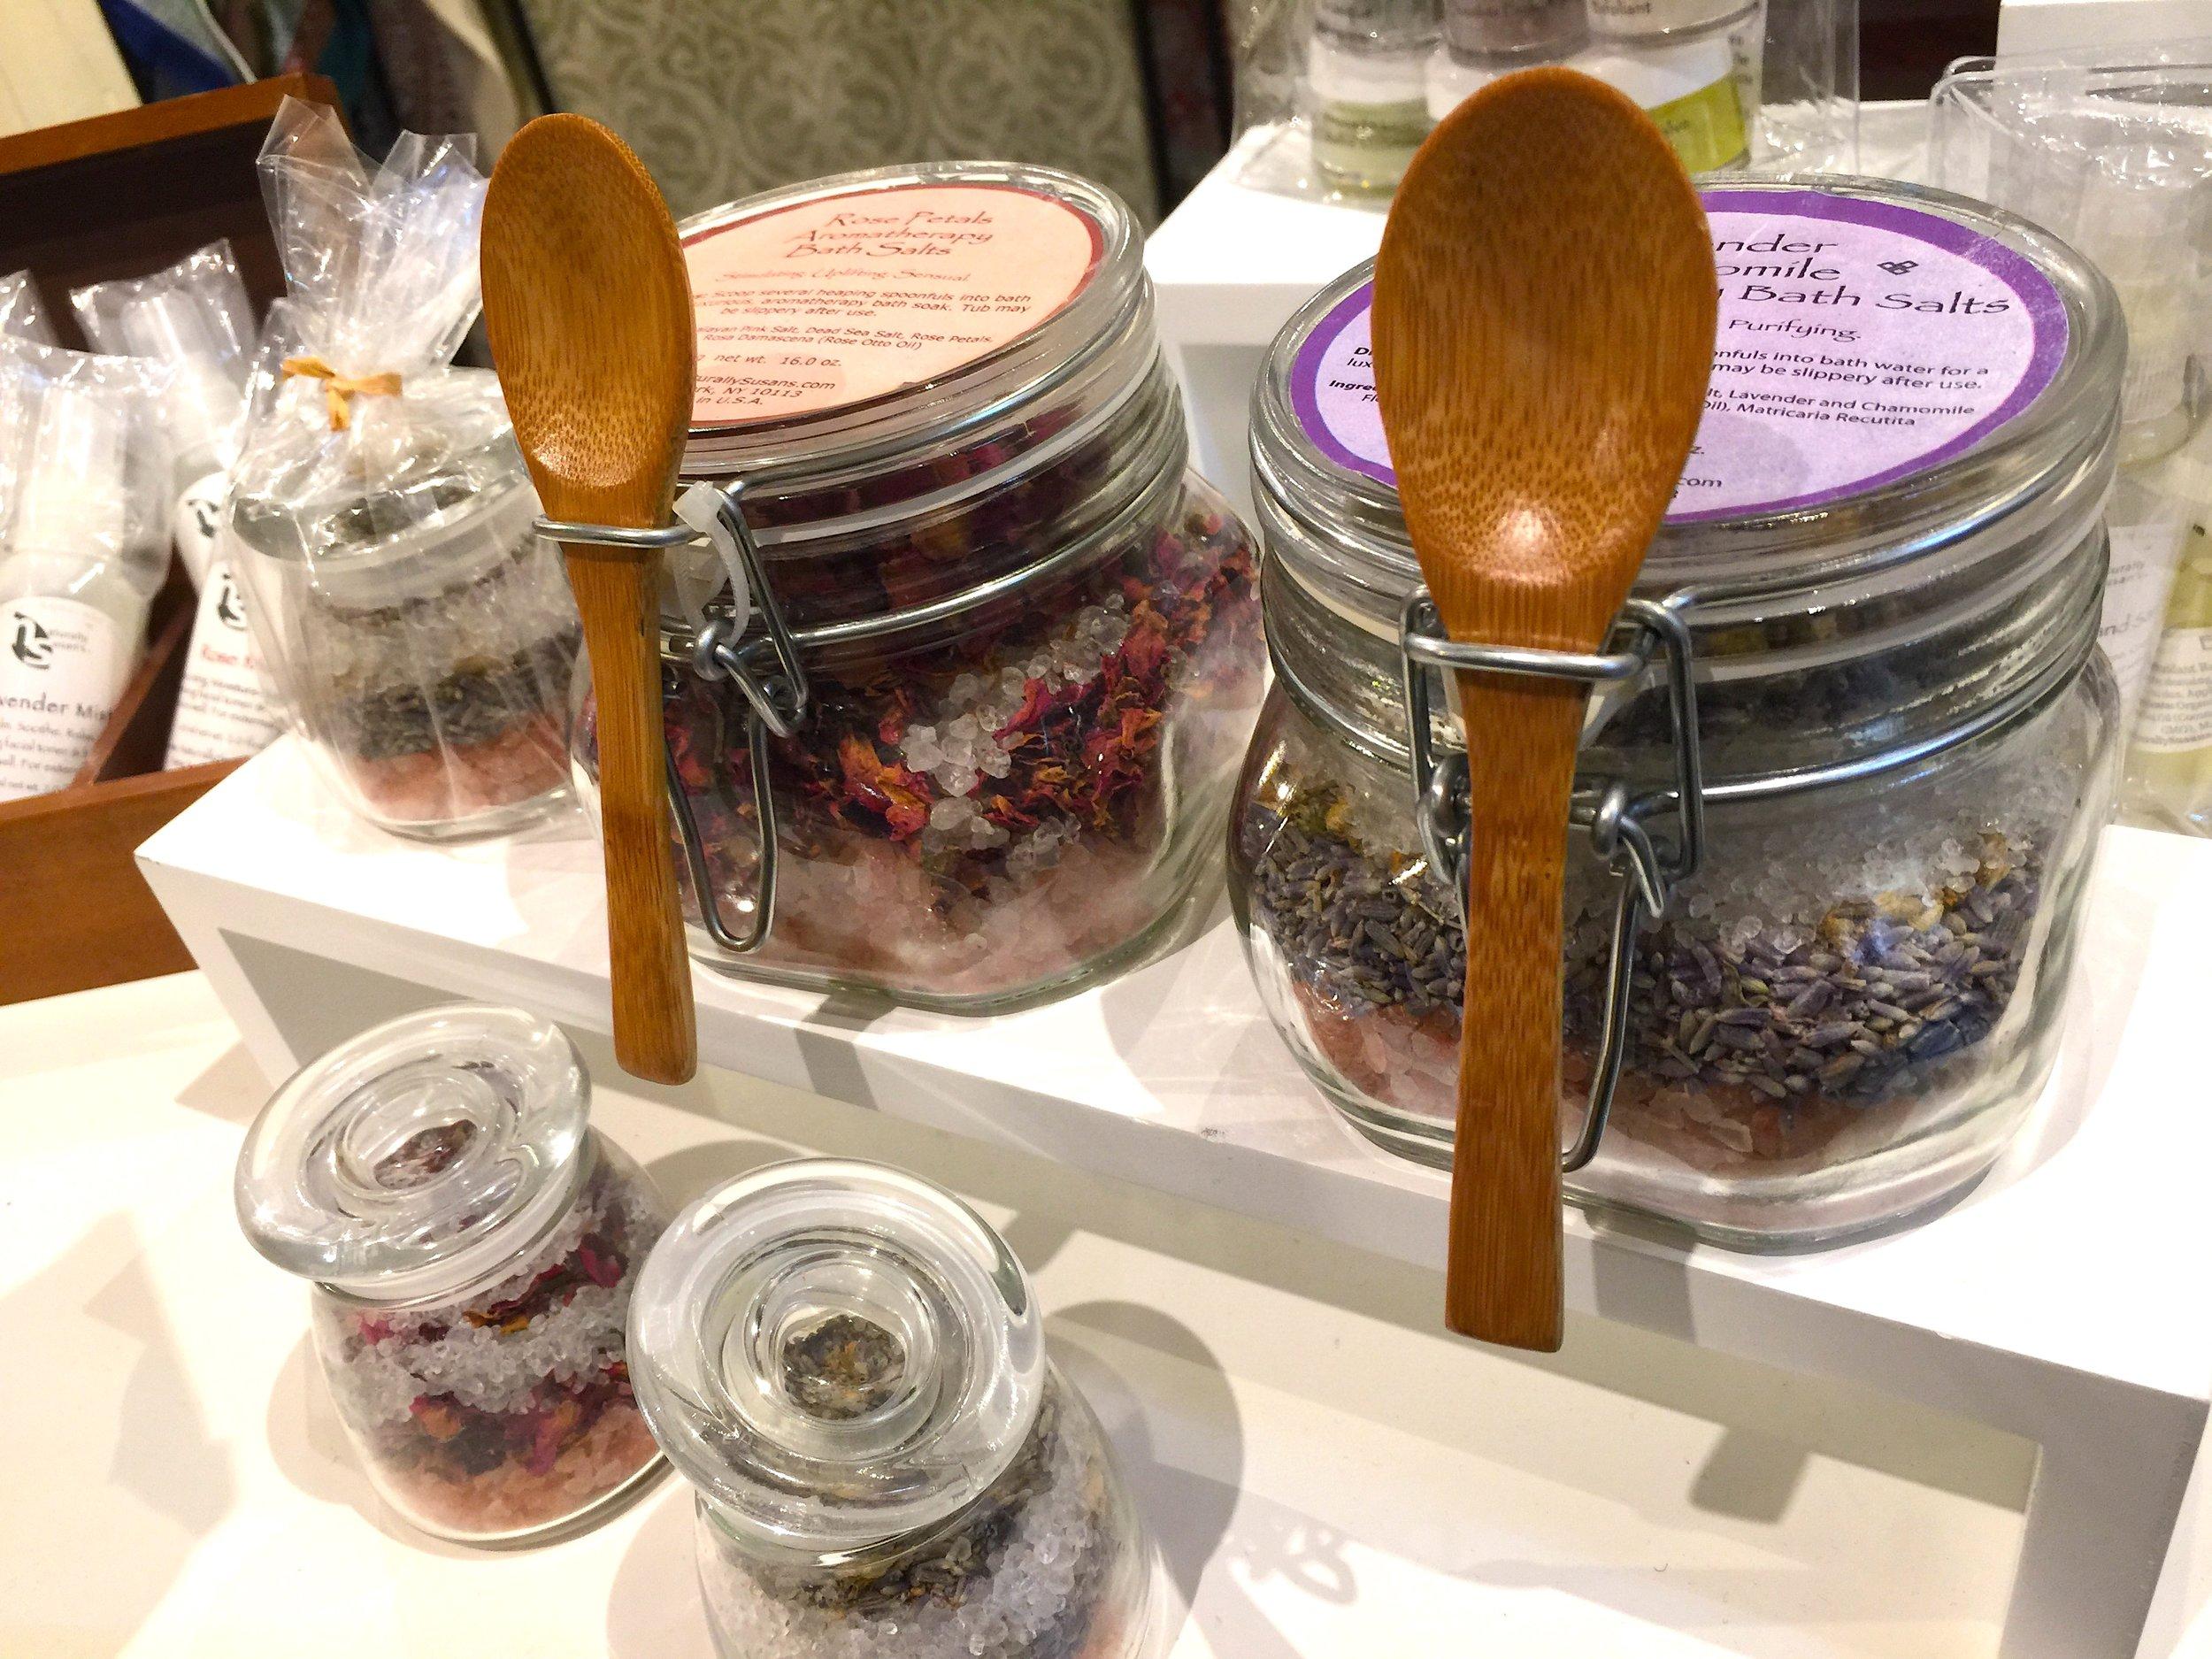 Bath salts by Naturally Susan's